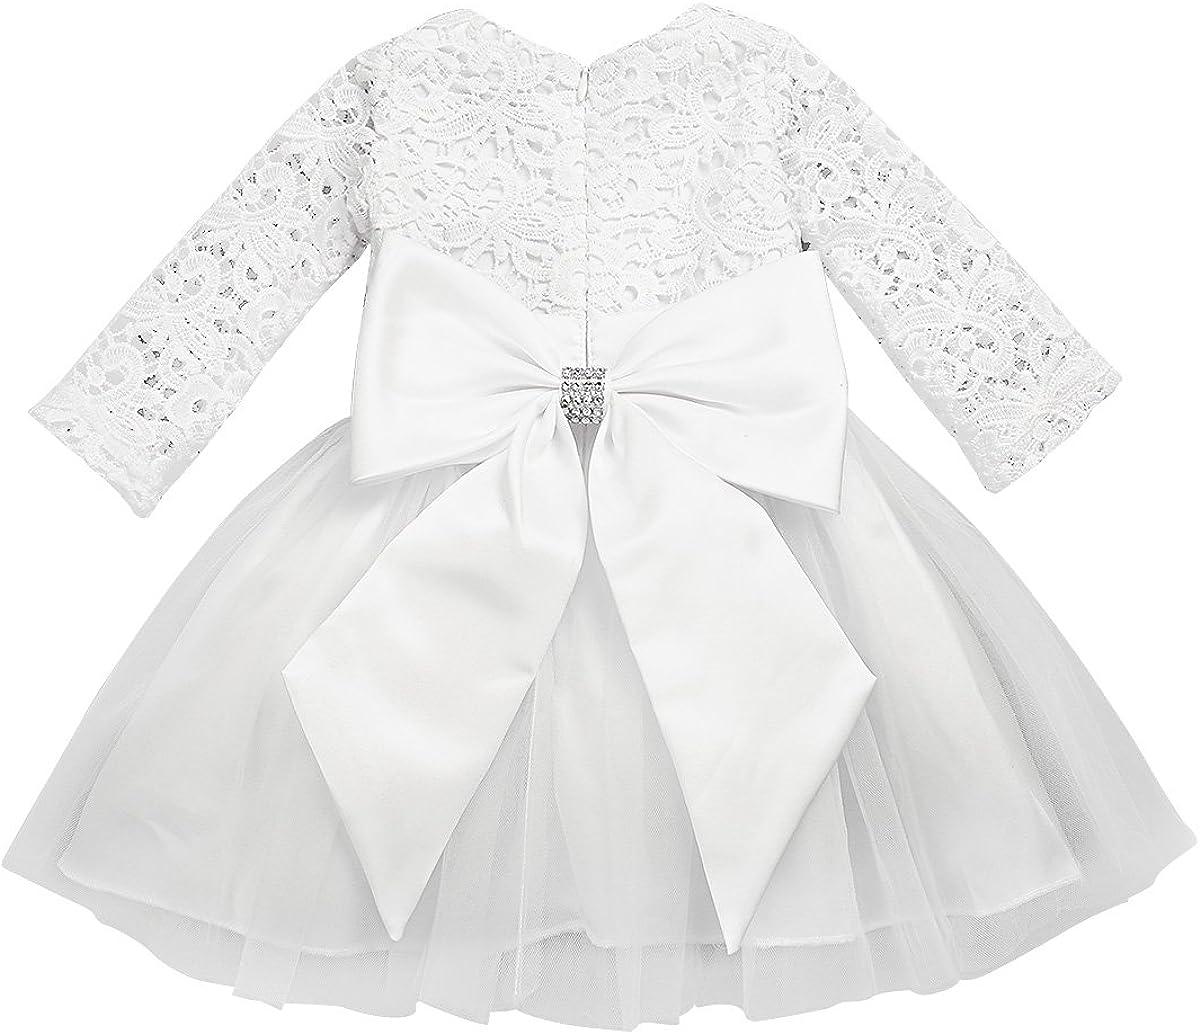 iiniim Baby Flower Girls Max 57% OFF Long Sleeve Baptism Crochet Lace Cheap super special price